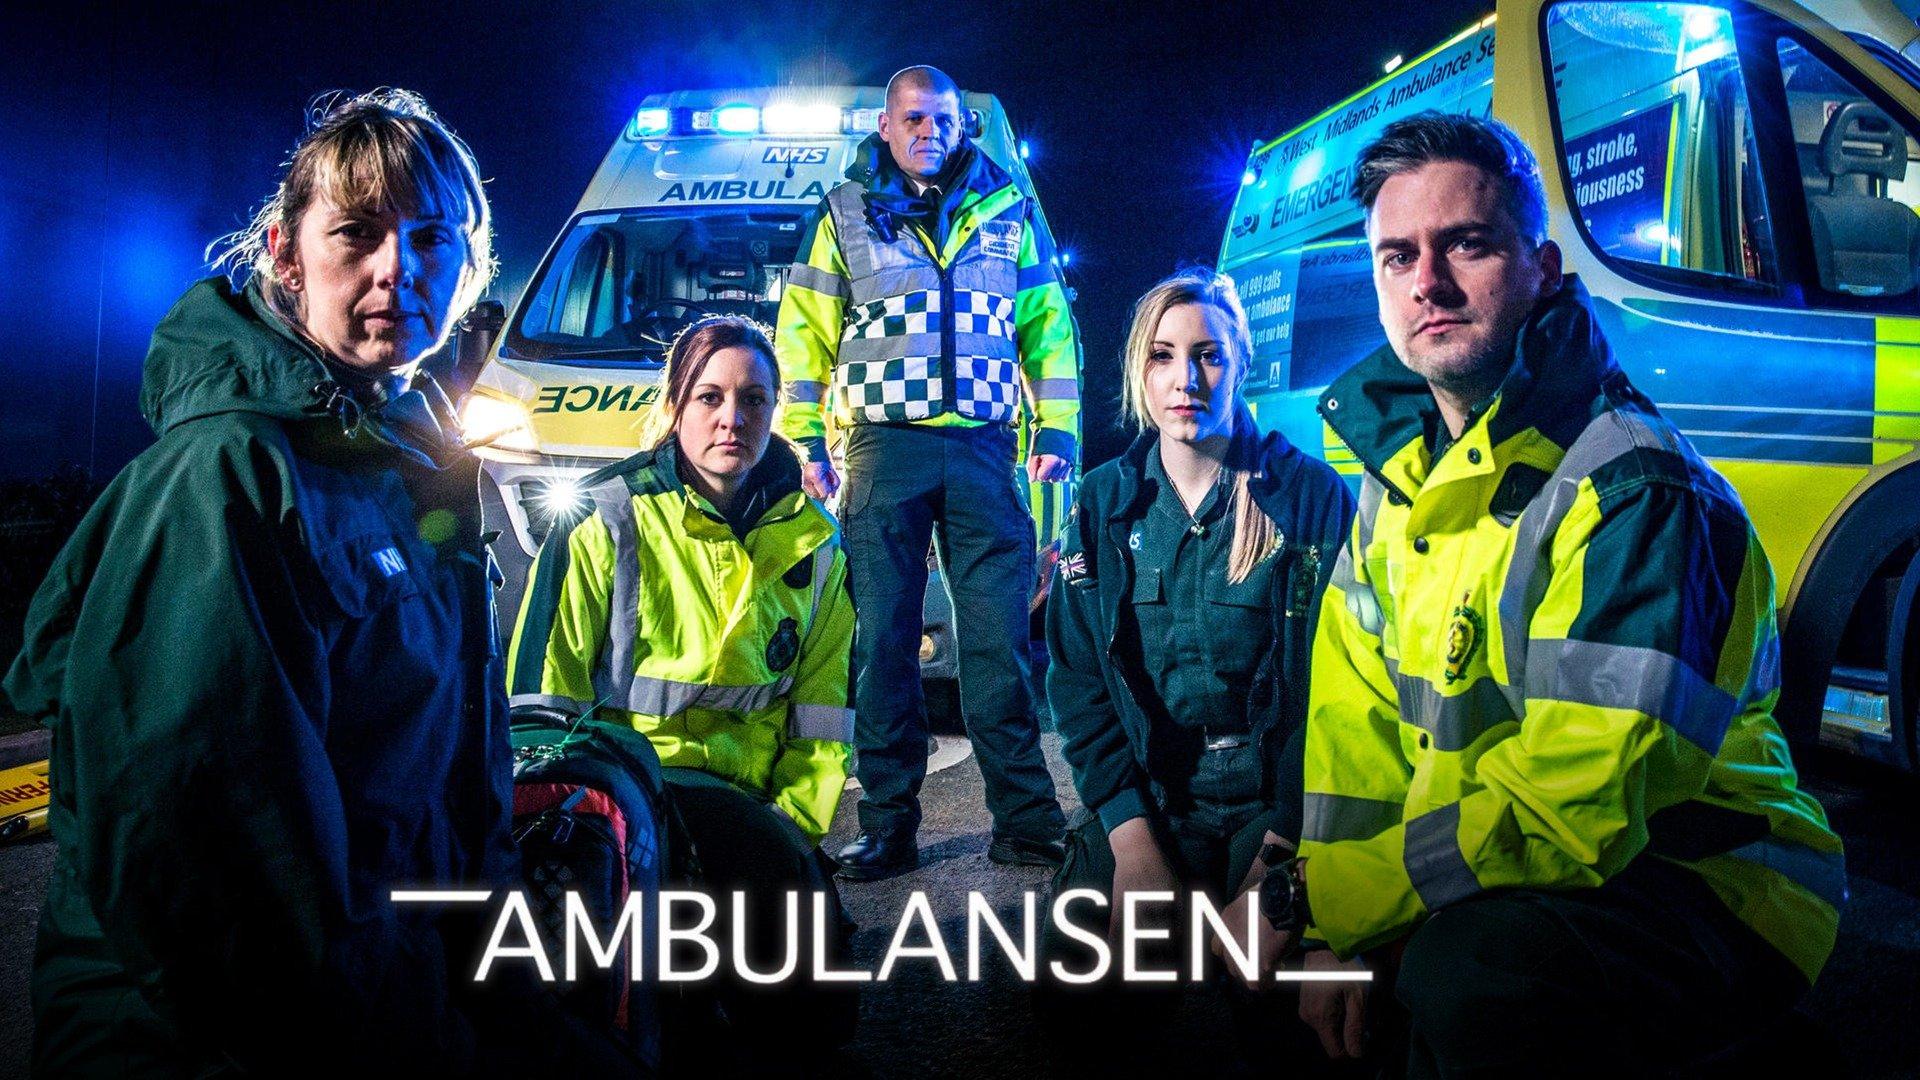 Ambulansen